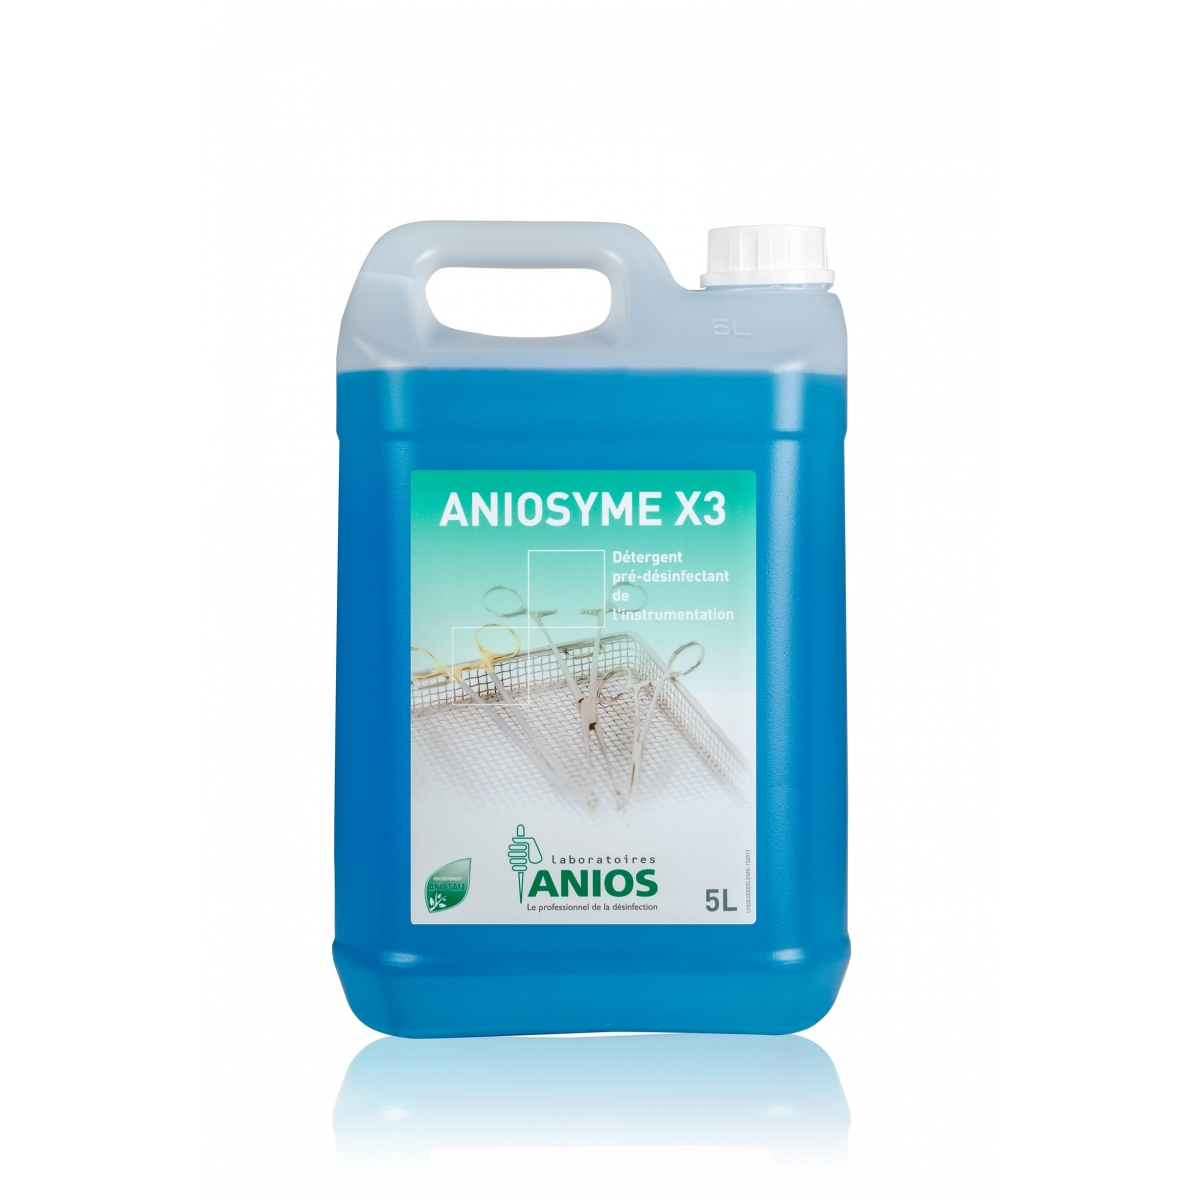 HYGIENE - DETERGENT PRE DESINFECTANT ANIOSYME X3 ANIOS